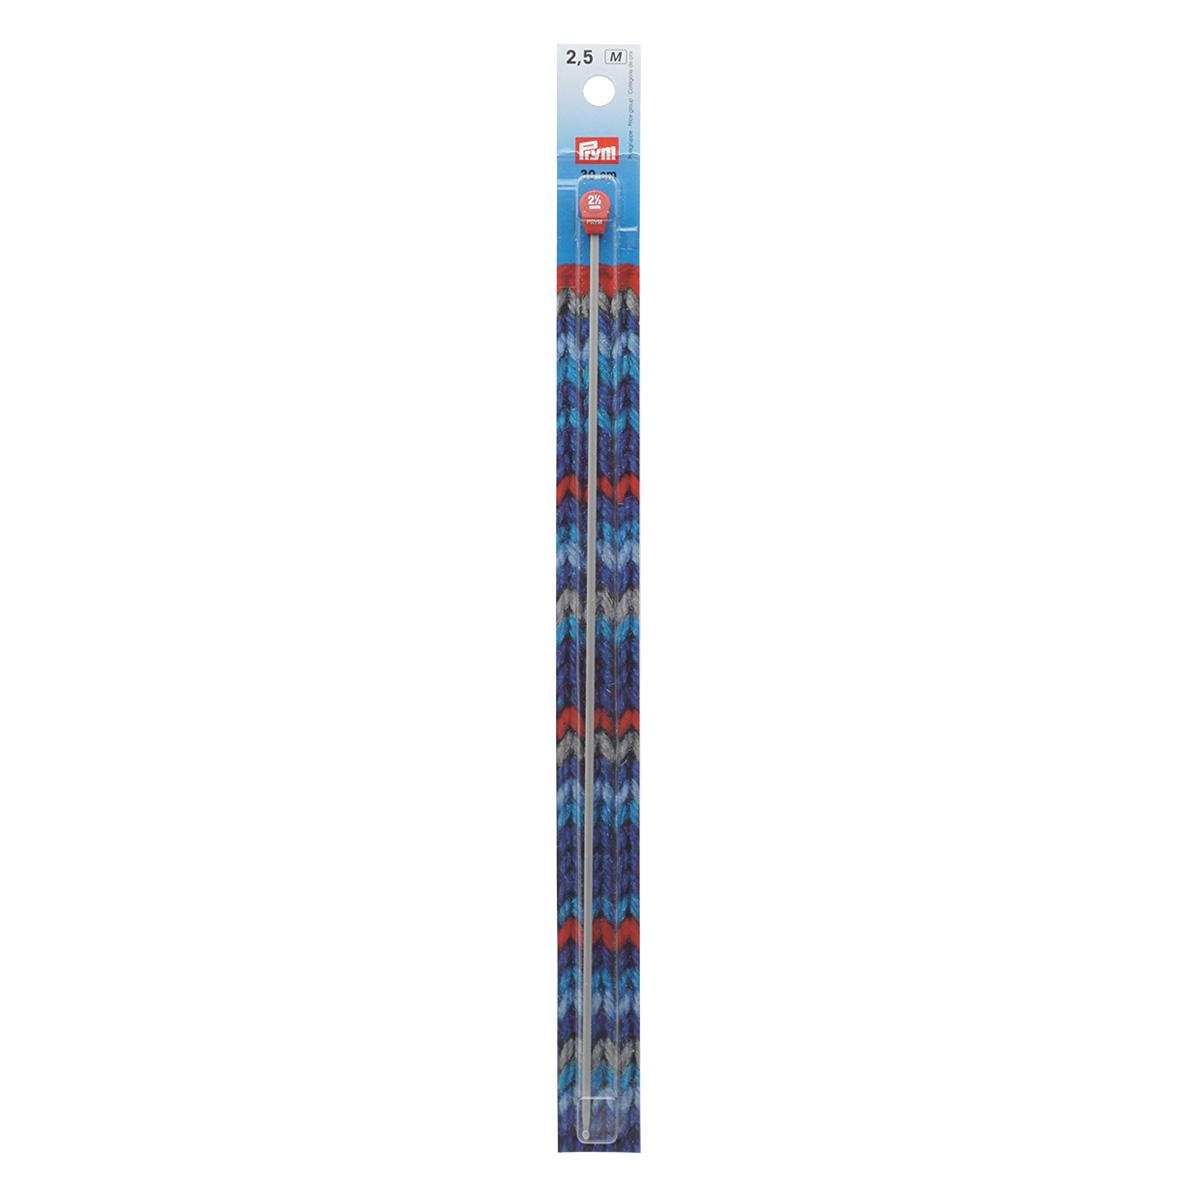 195214 Крючок для вязания тунисский, 2,5 мм*30 см, Prym